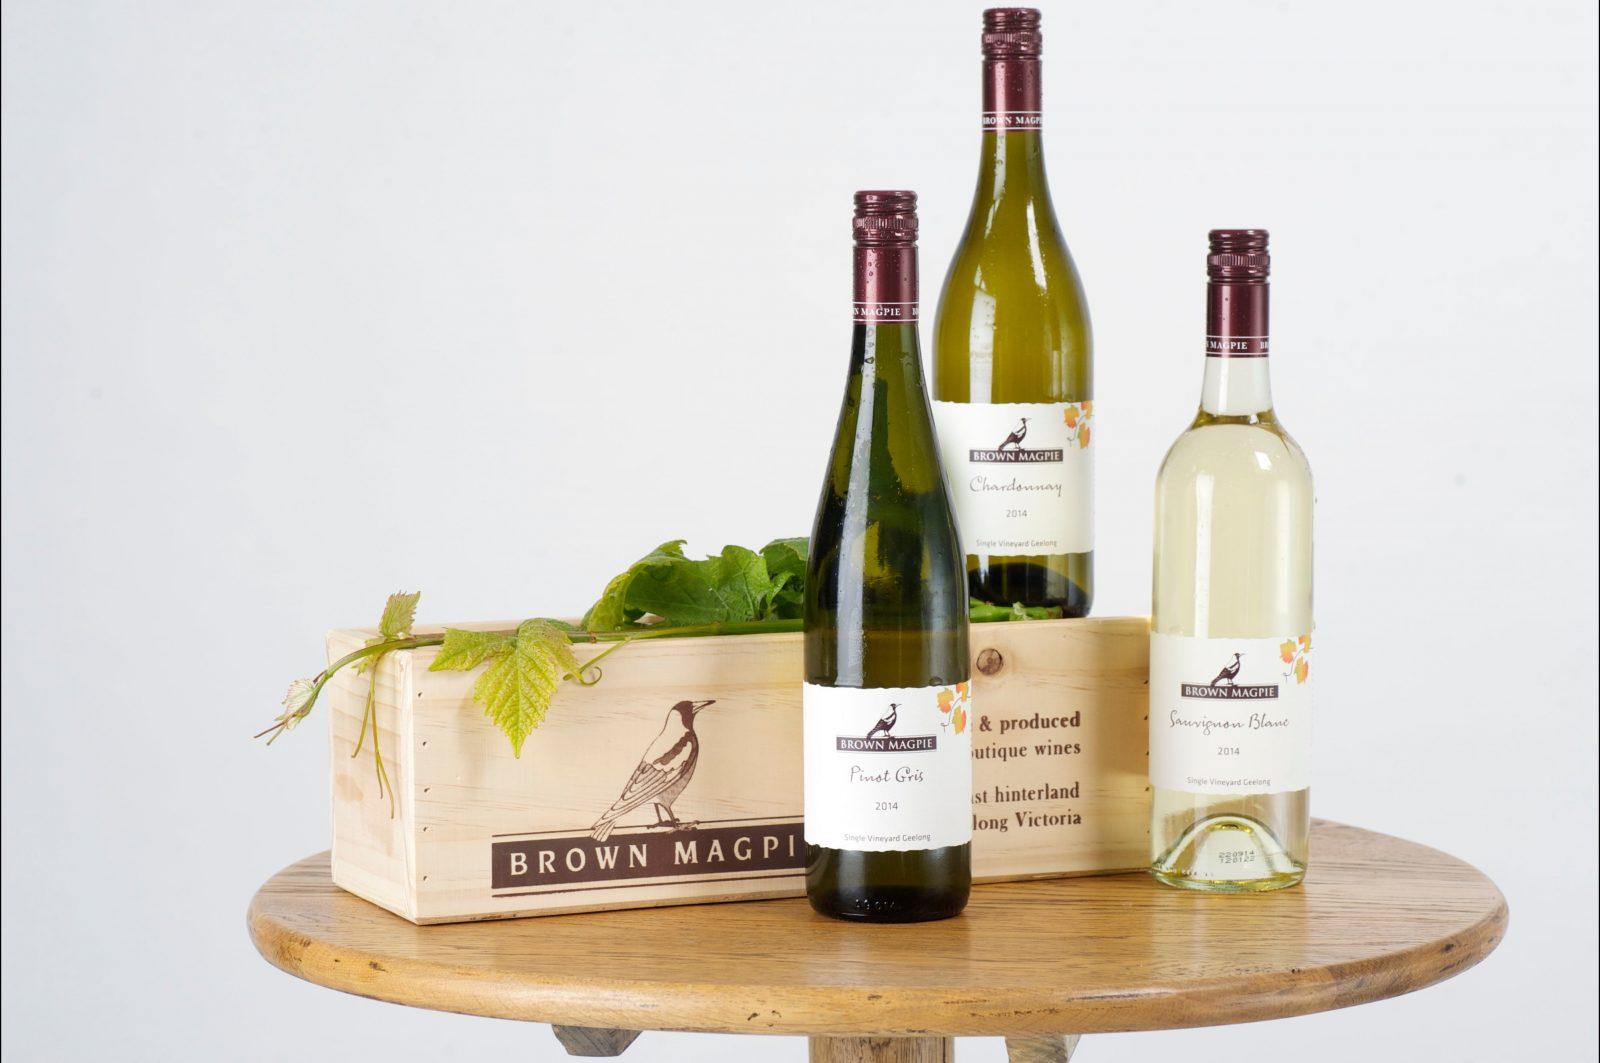 Brown Magpie Wines